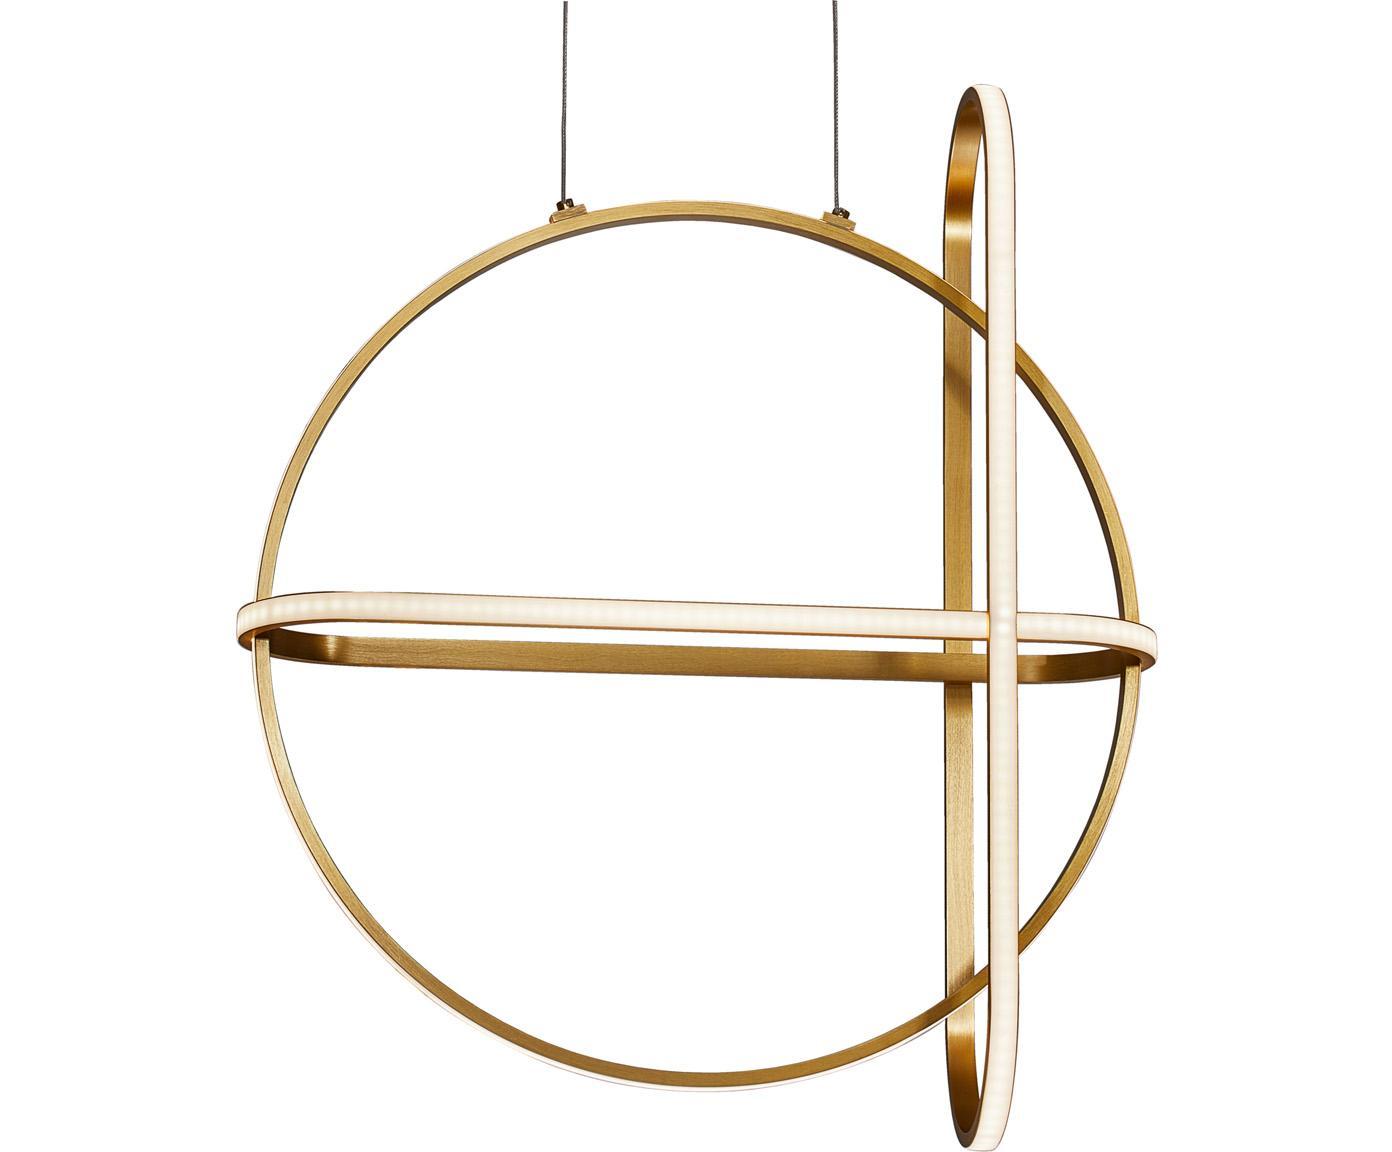 LED hanglamp Arte in messing, Diffuser: acrylglas, Baldakijn: gecoat aluminium, Messingkleurig, 52 x 120 cm